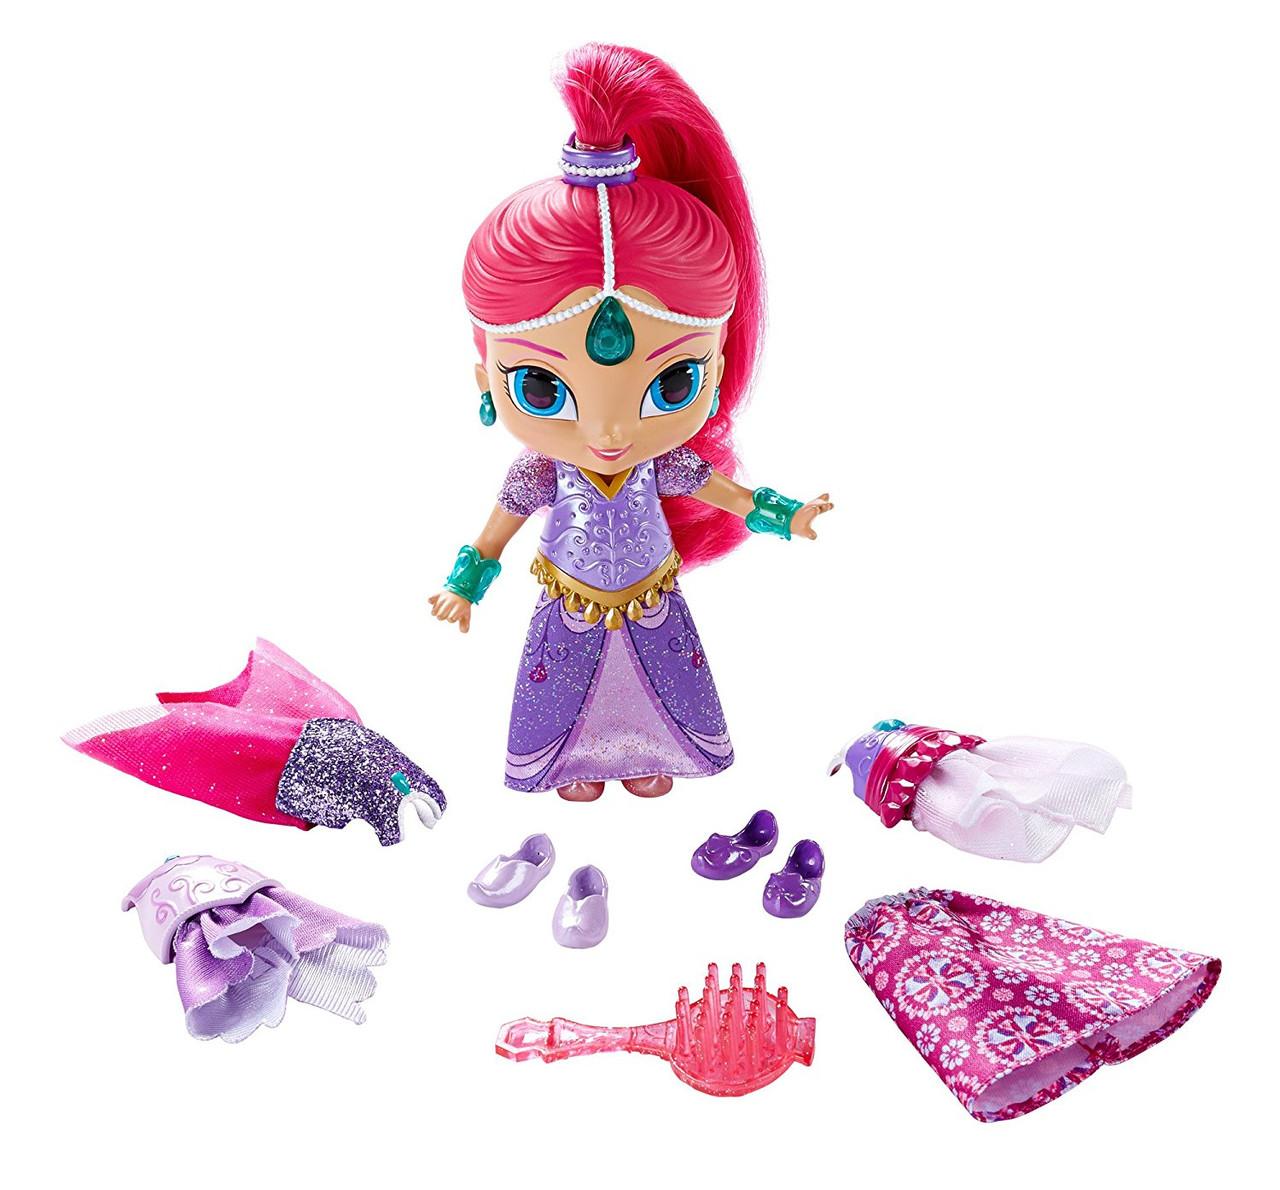 Кукла джинн Шиммер набор магия одежды м/ф Шиммер и Шайн Фишер прайс Fisher-Price Shimmer and Shine